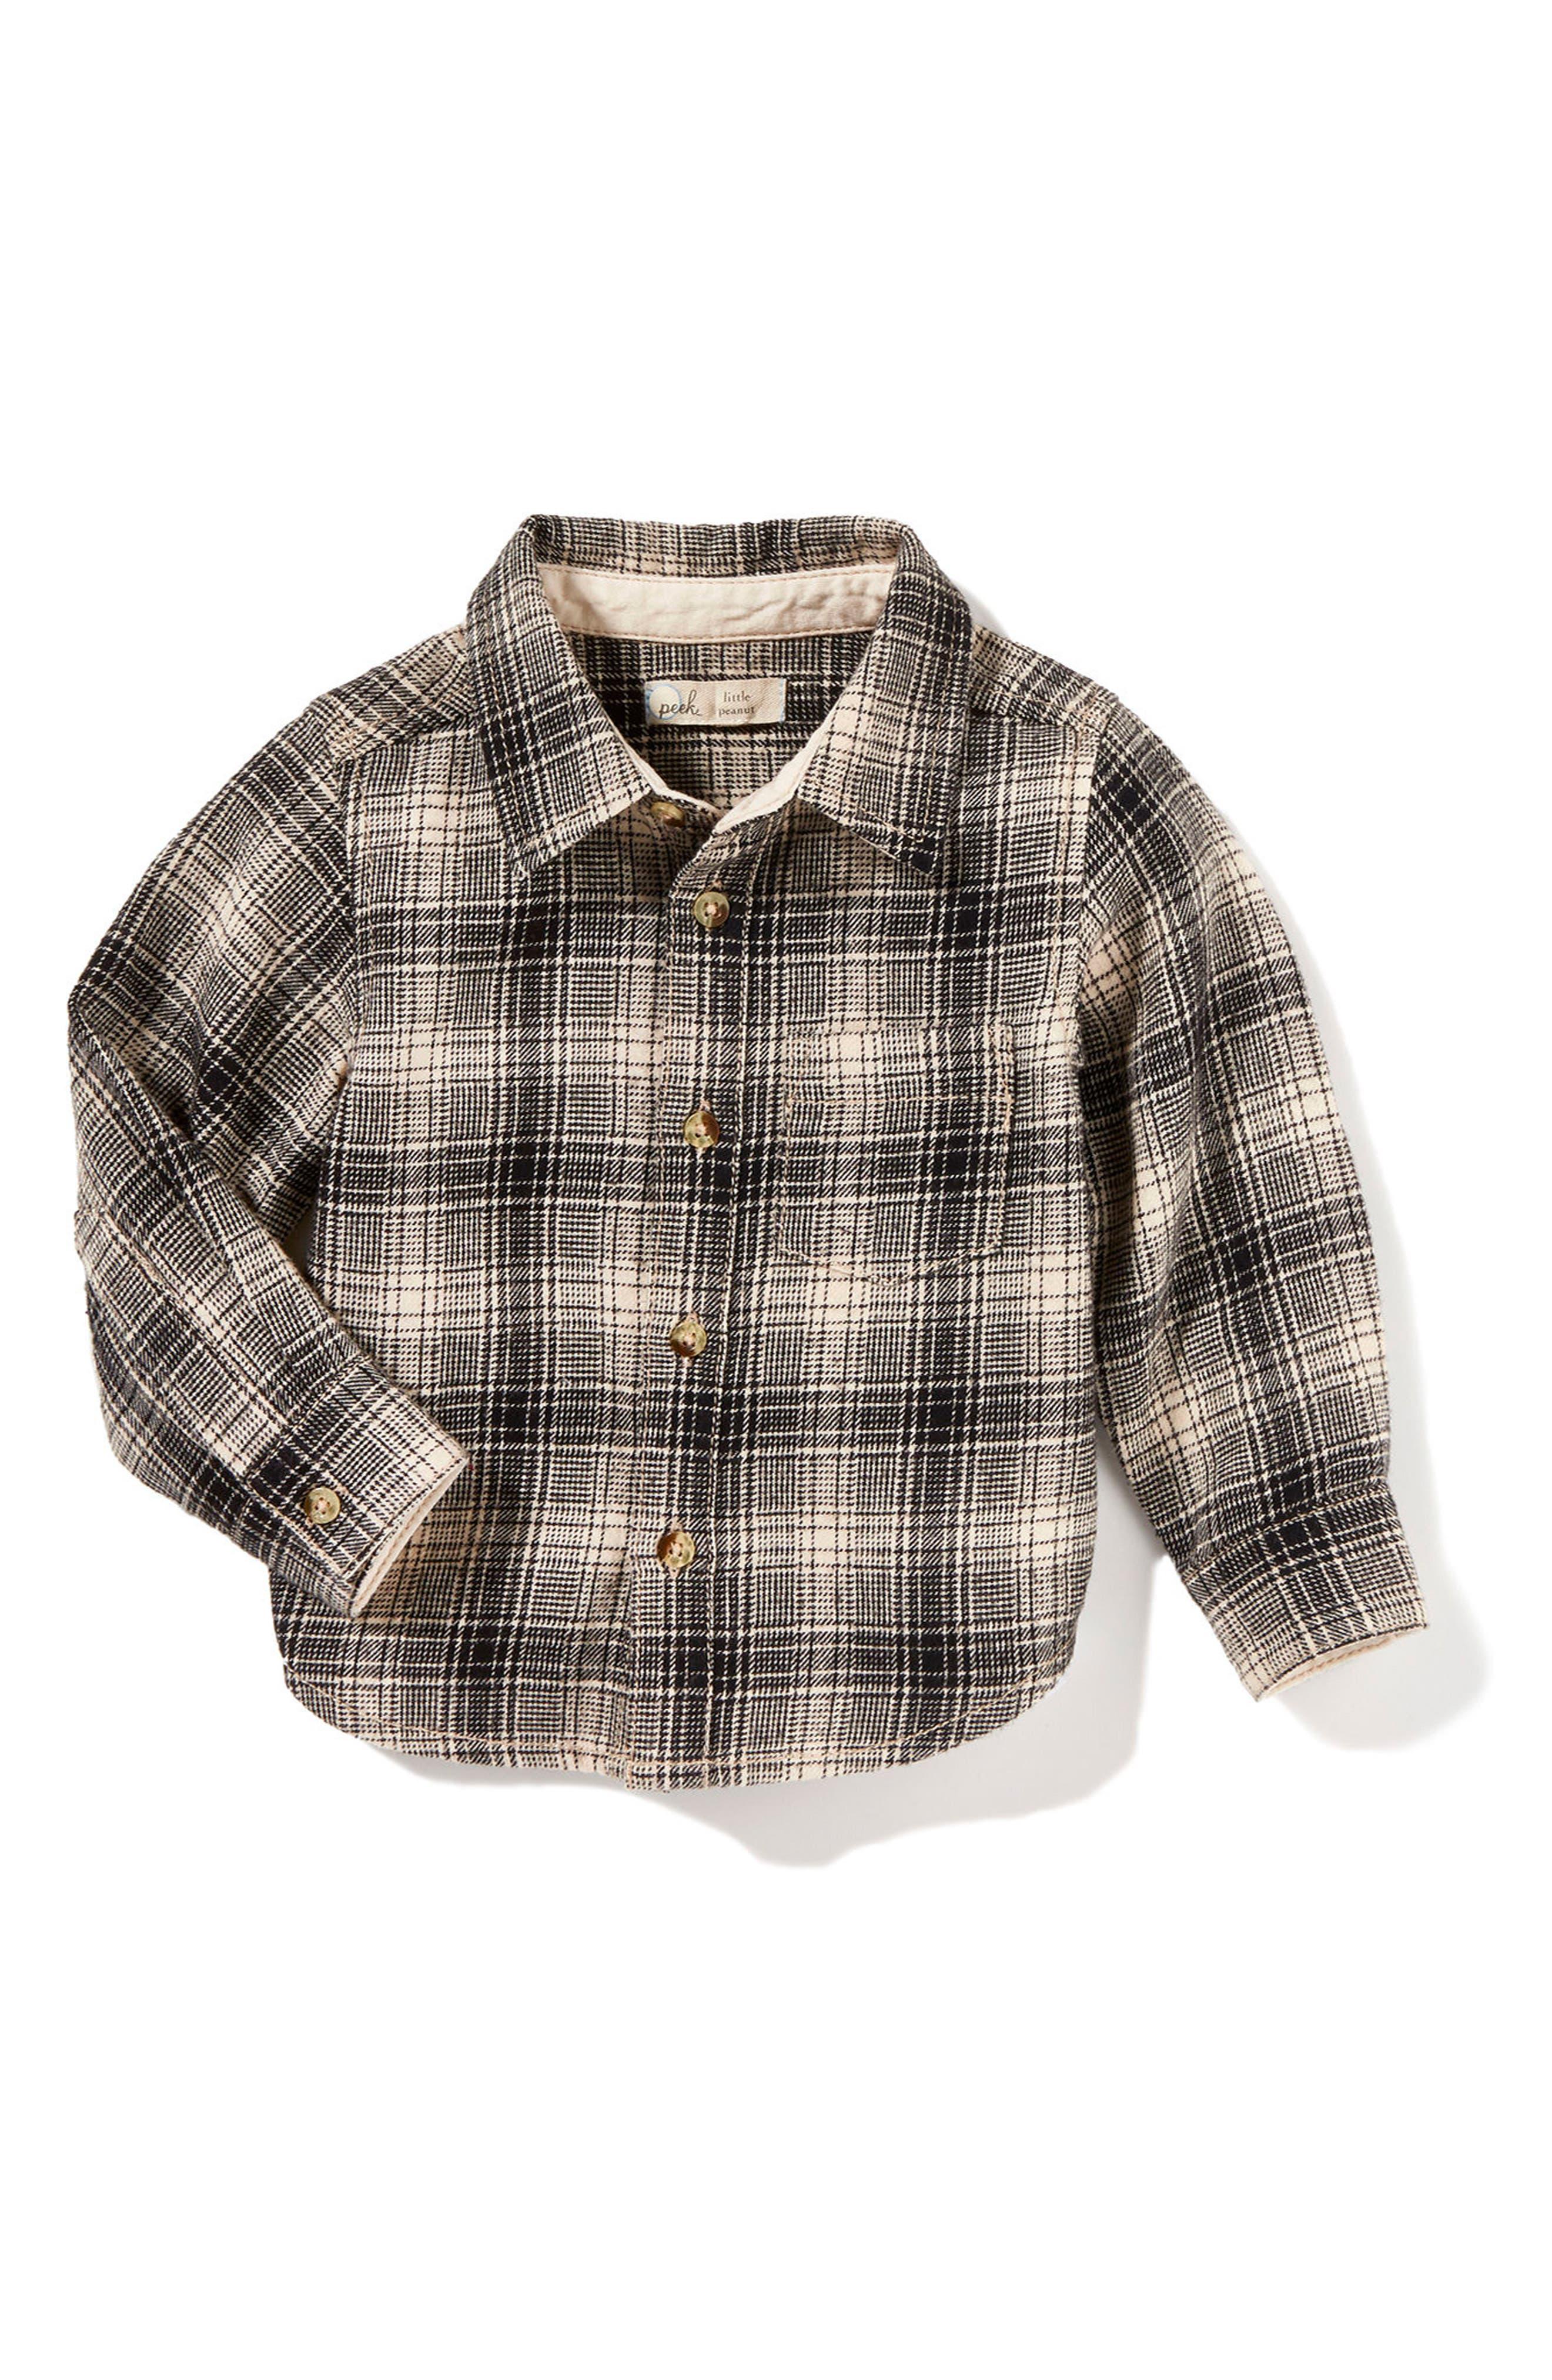 Mase Plaid Shirt,                         Main,                         color, Black